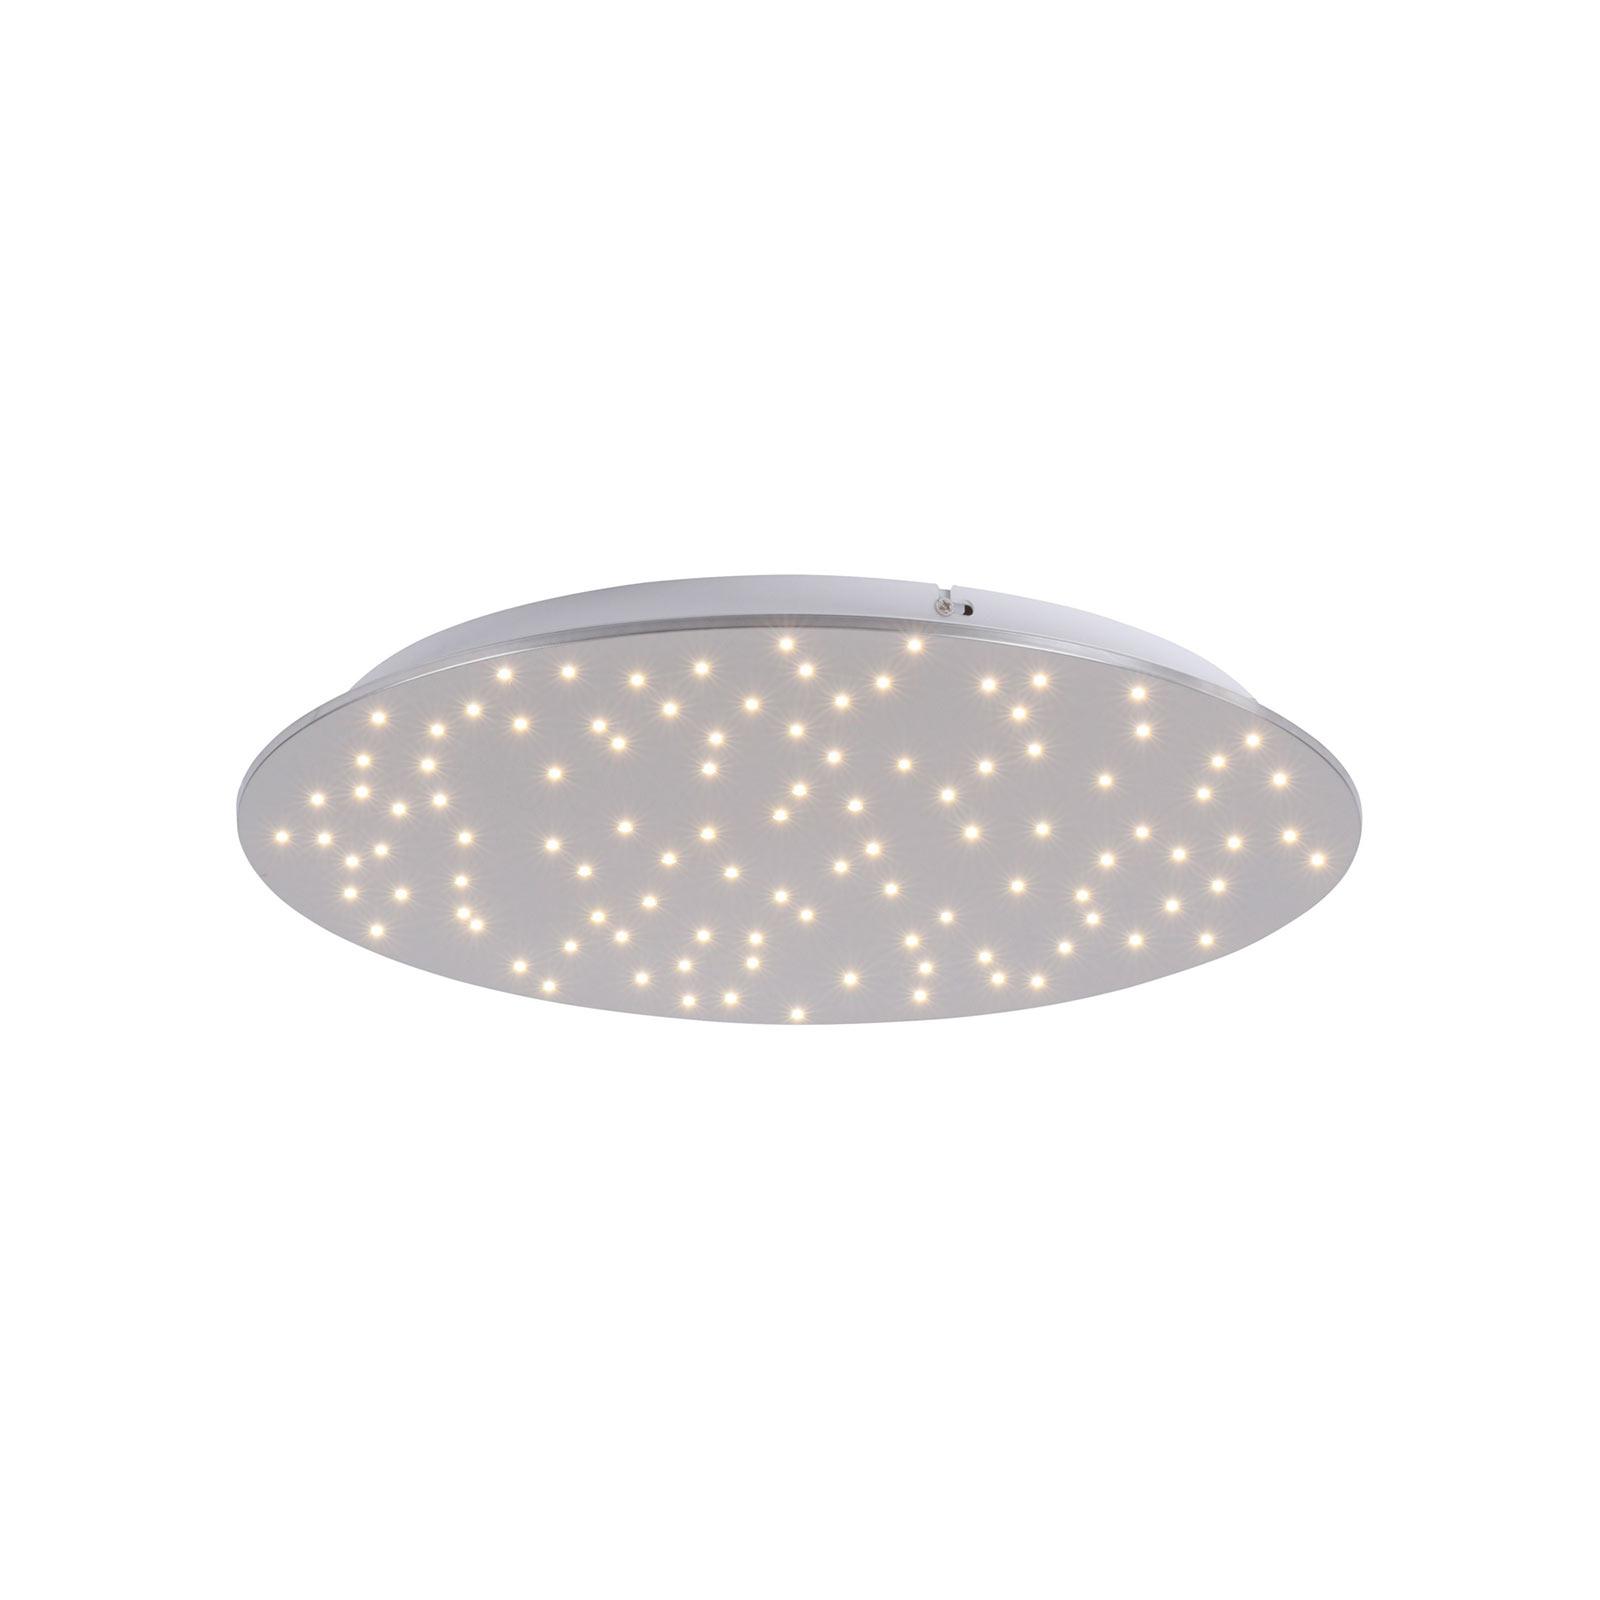 Lampa sufitowa LED Sparkle tunable white, Ø 48 cm